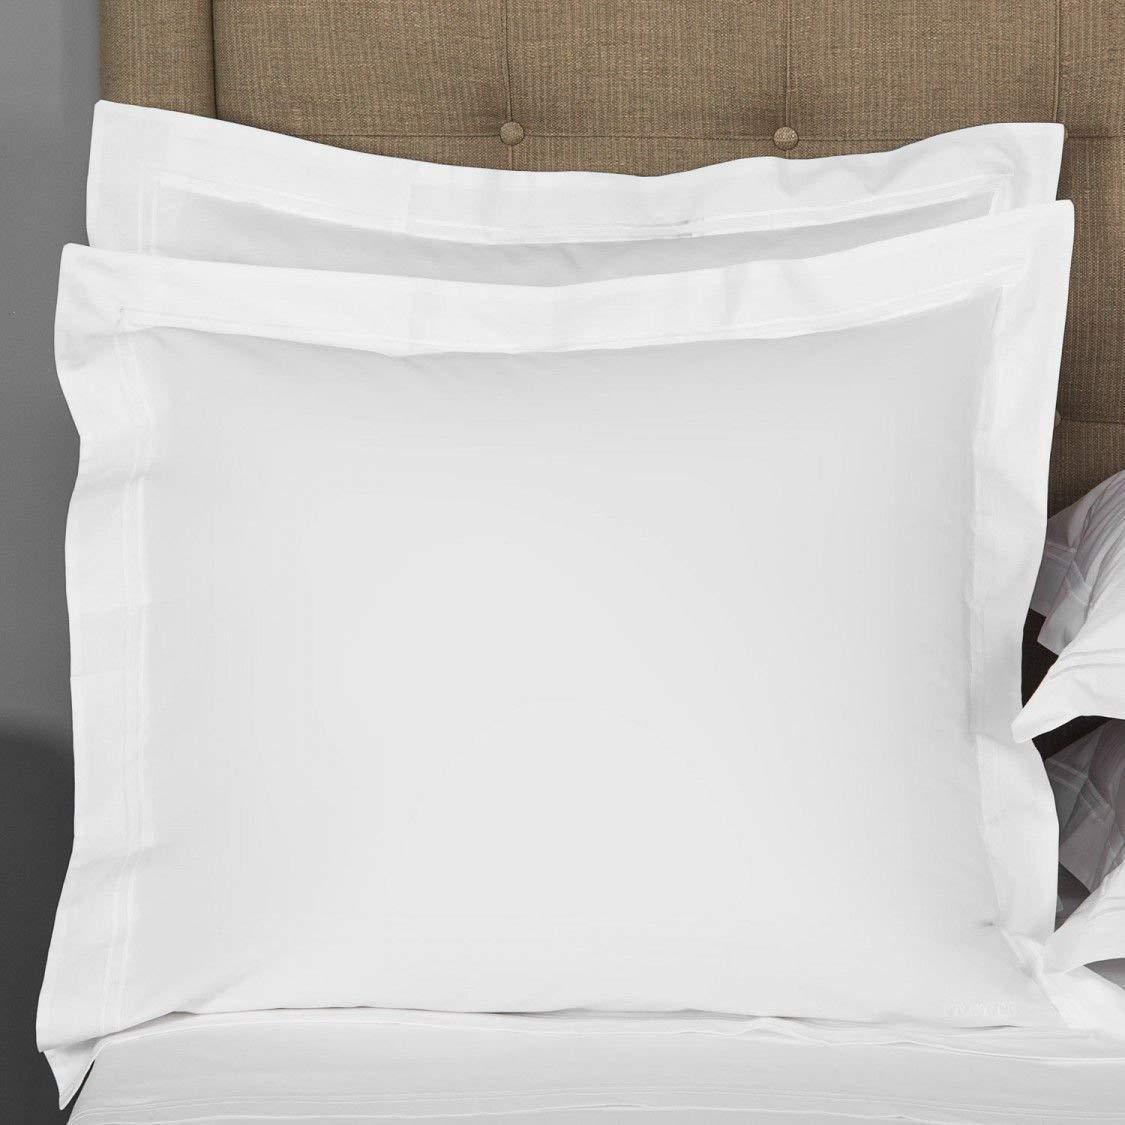 Amazon Com Jpbeddings European Square Pillow Shams Set Of 2